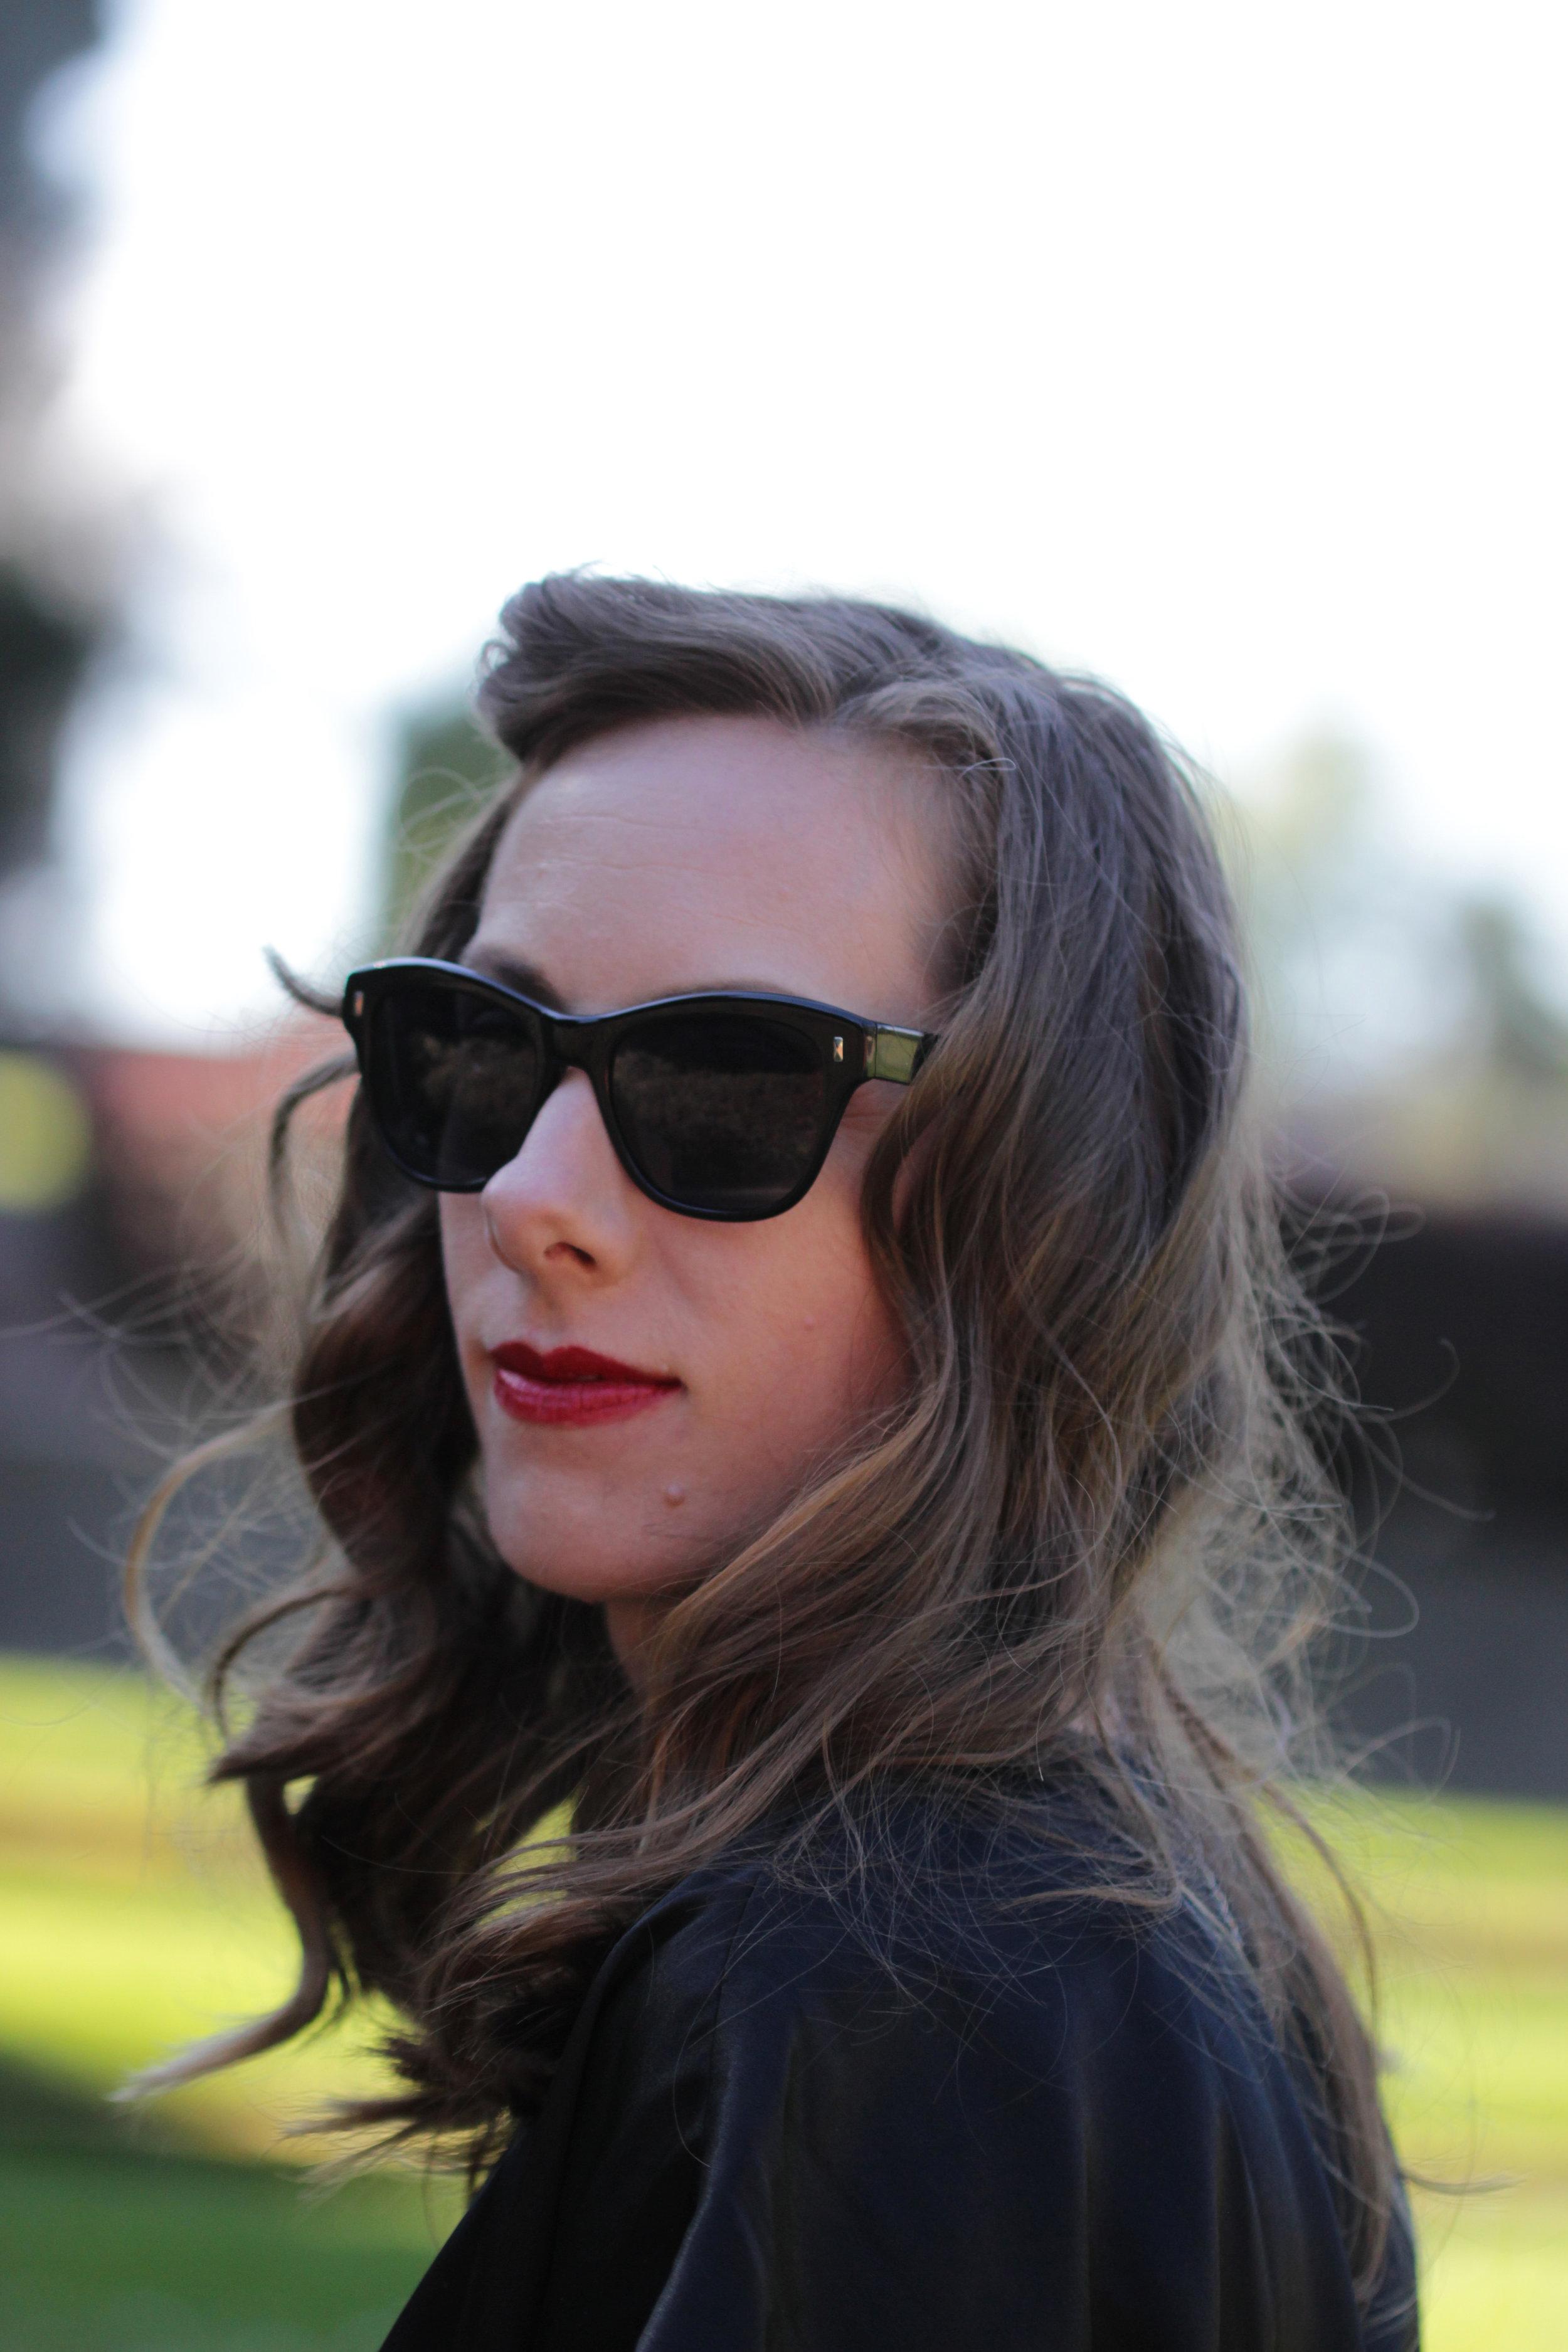 retro-hair-and-makeup.jpg